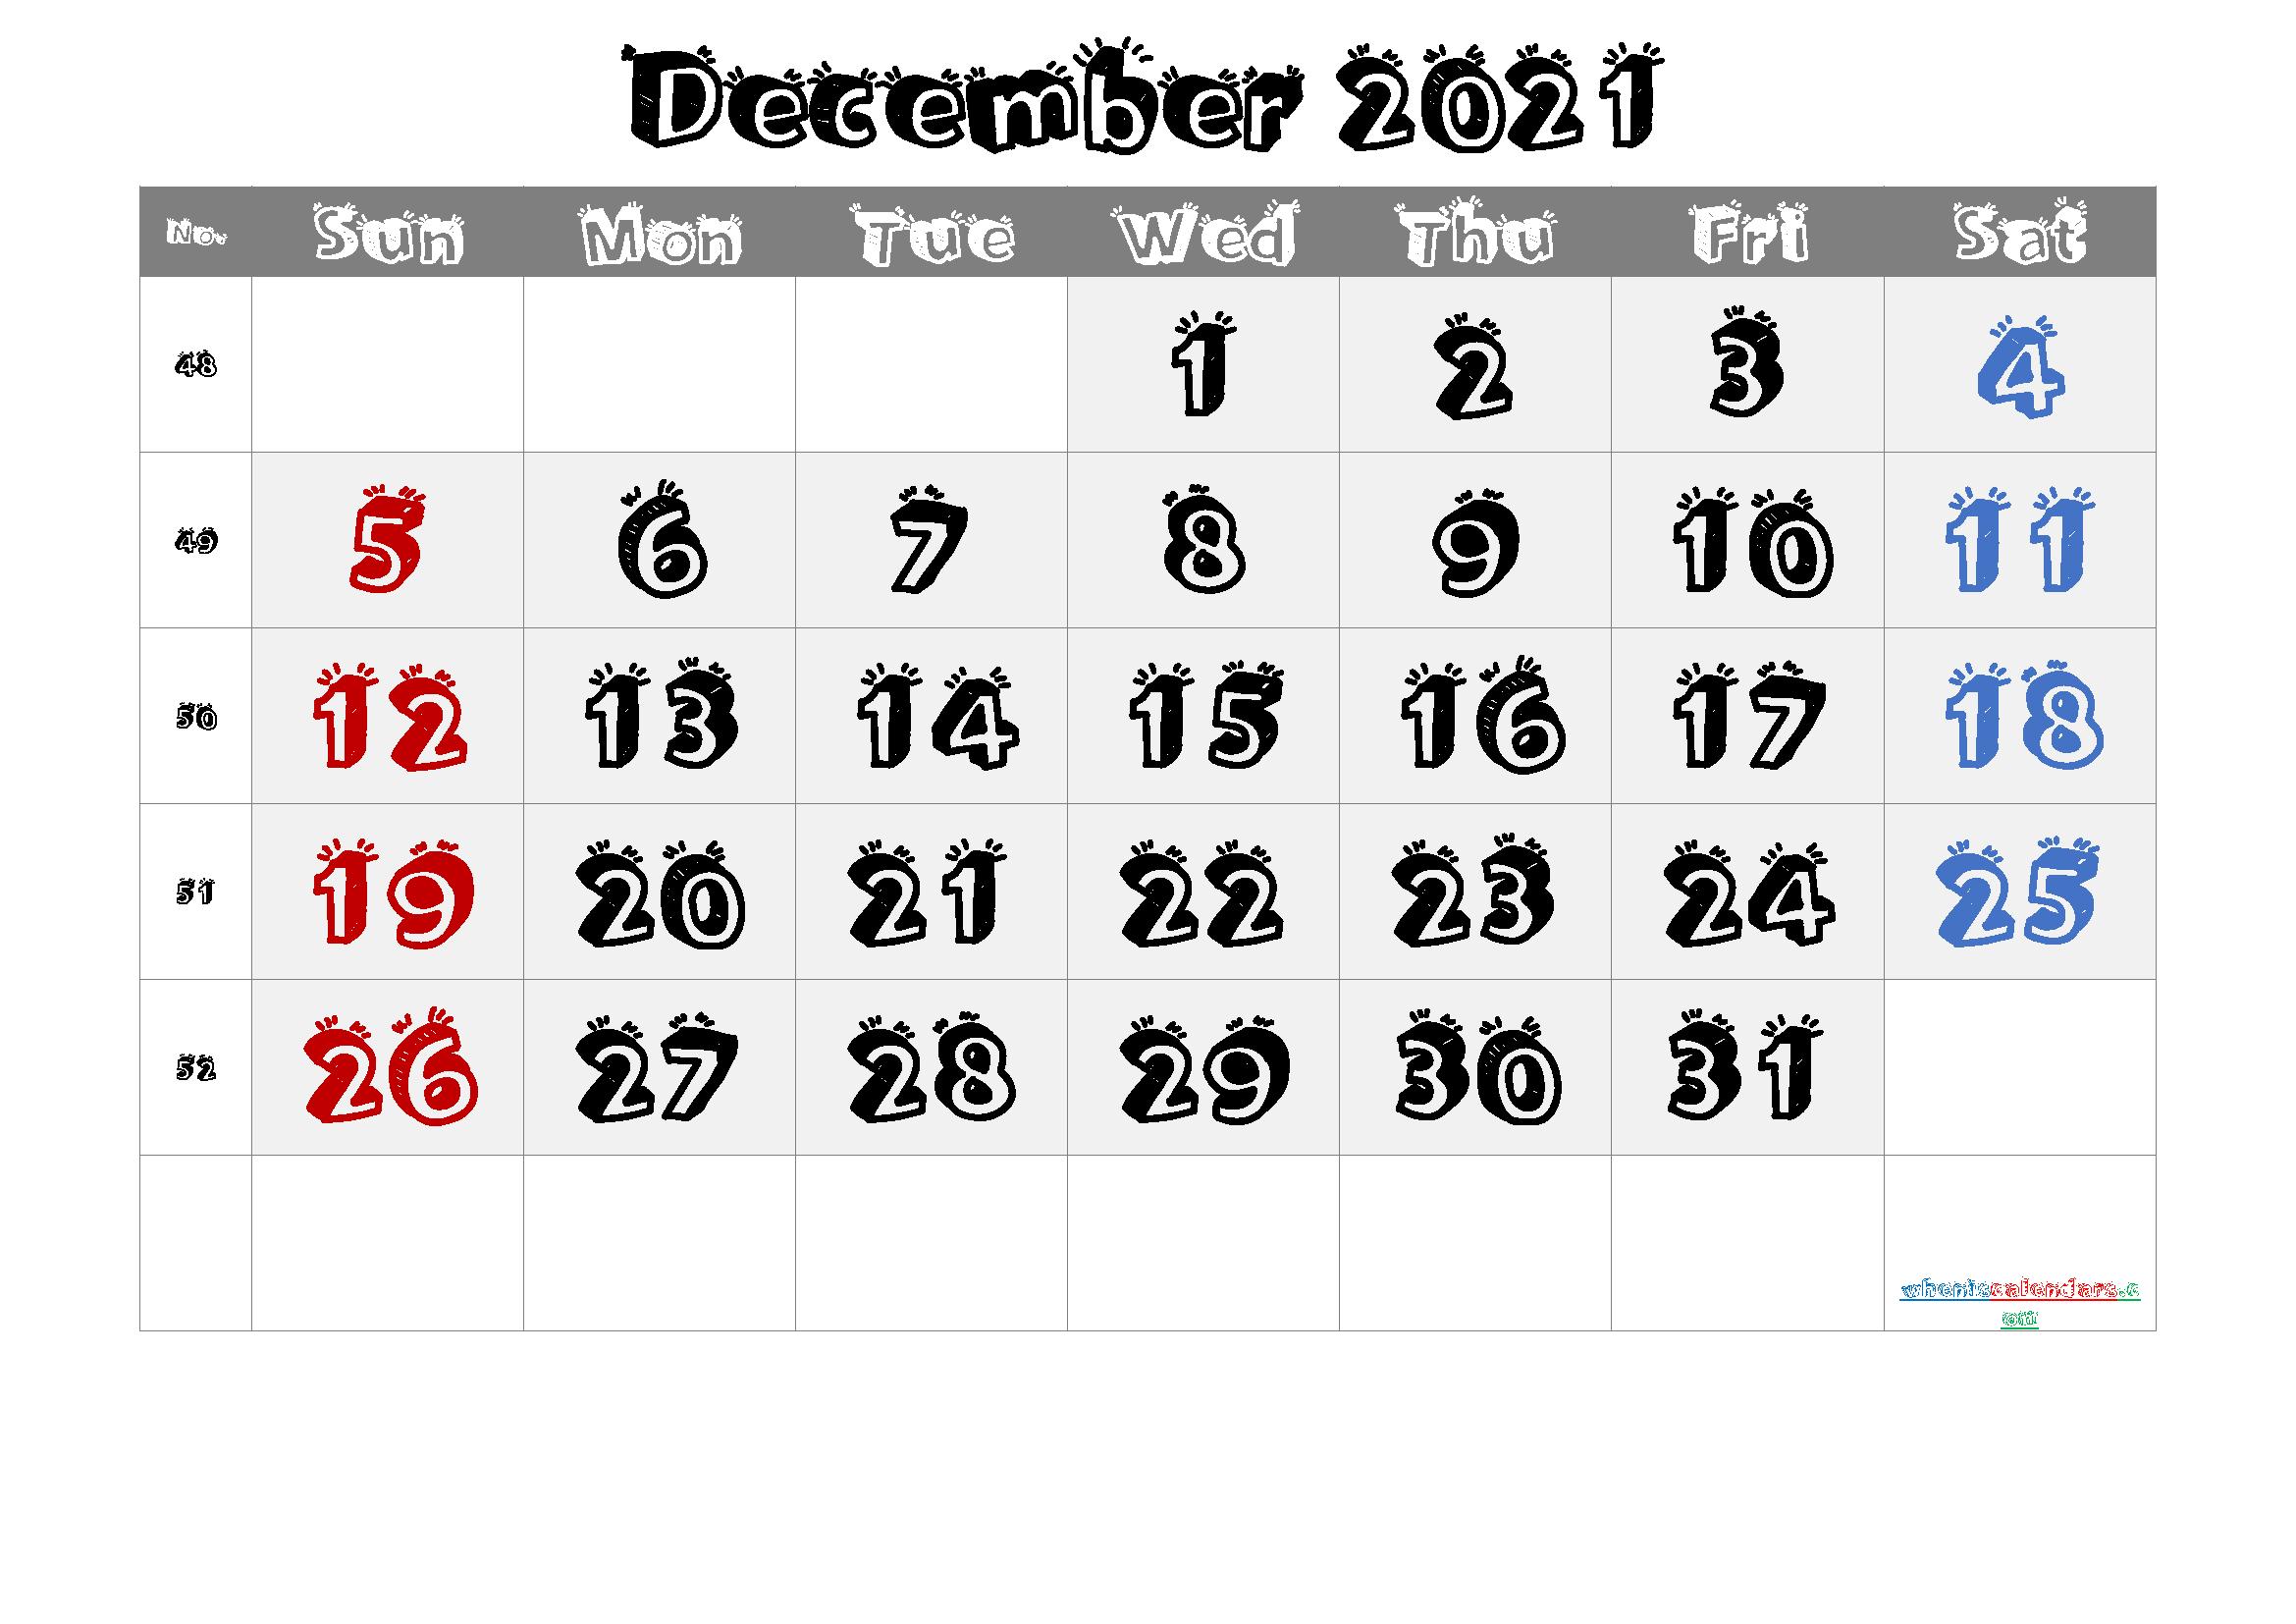 2021 December Free Printable Calendar - 6 Templates | Free Printable 2020 Monthly Calendar With